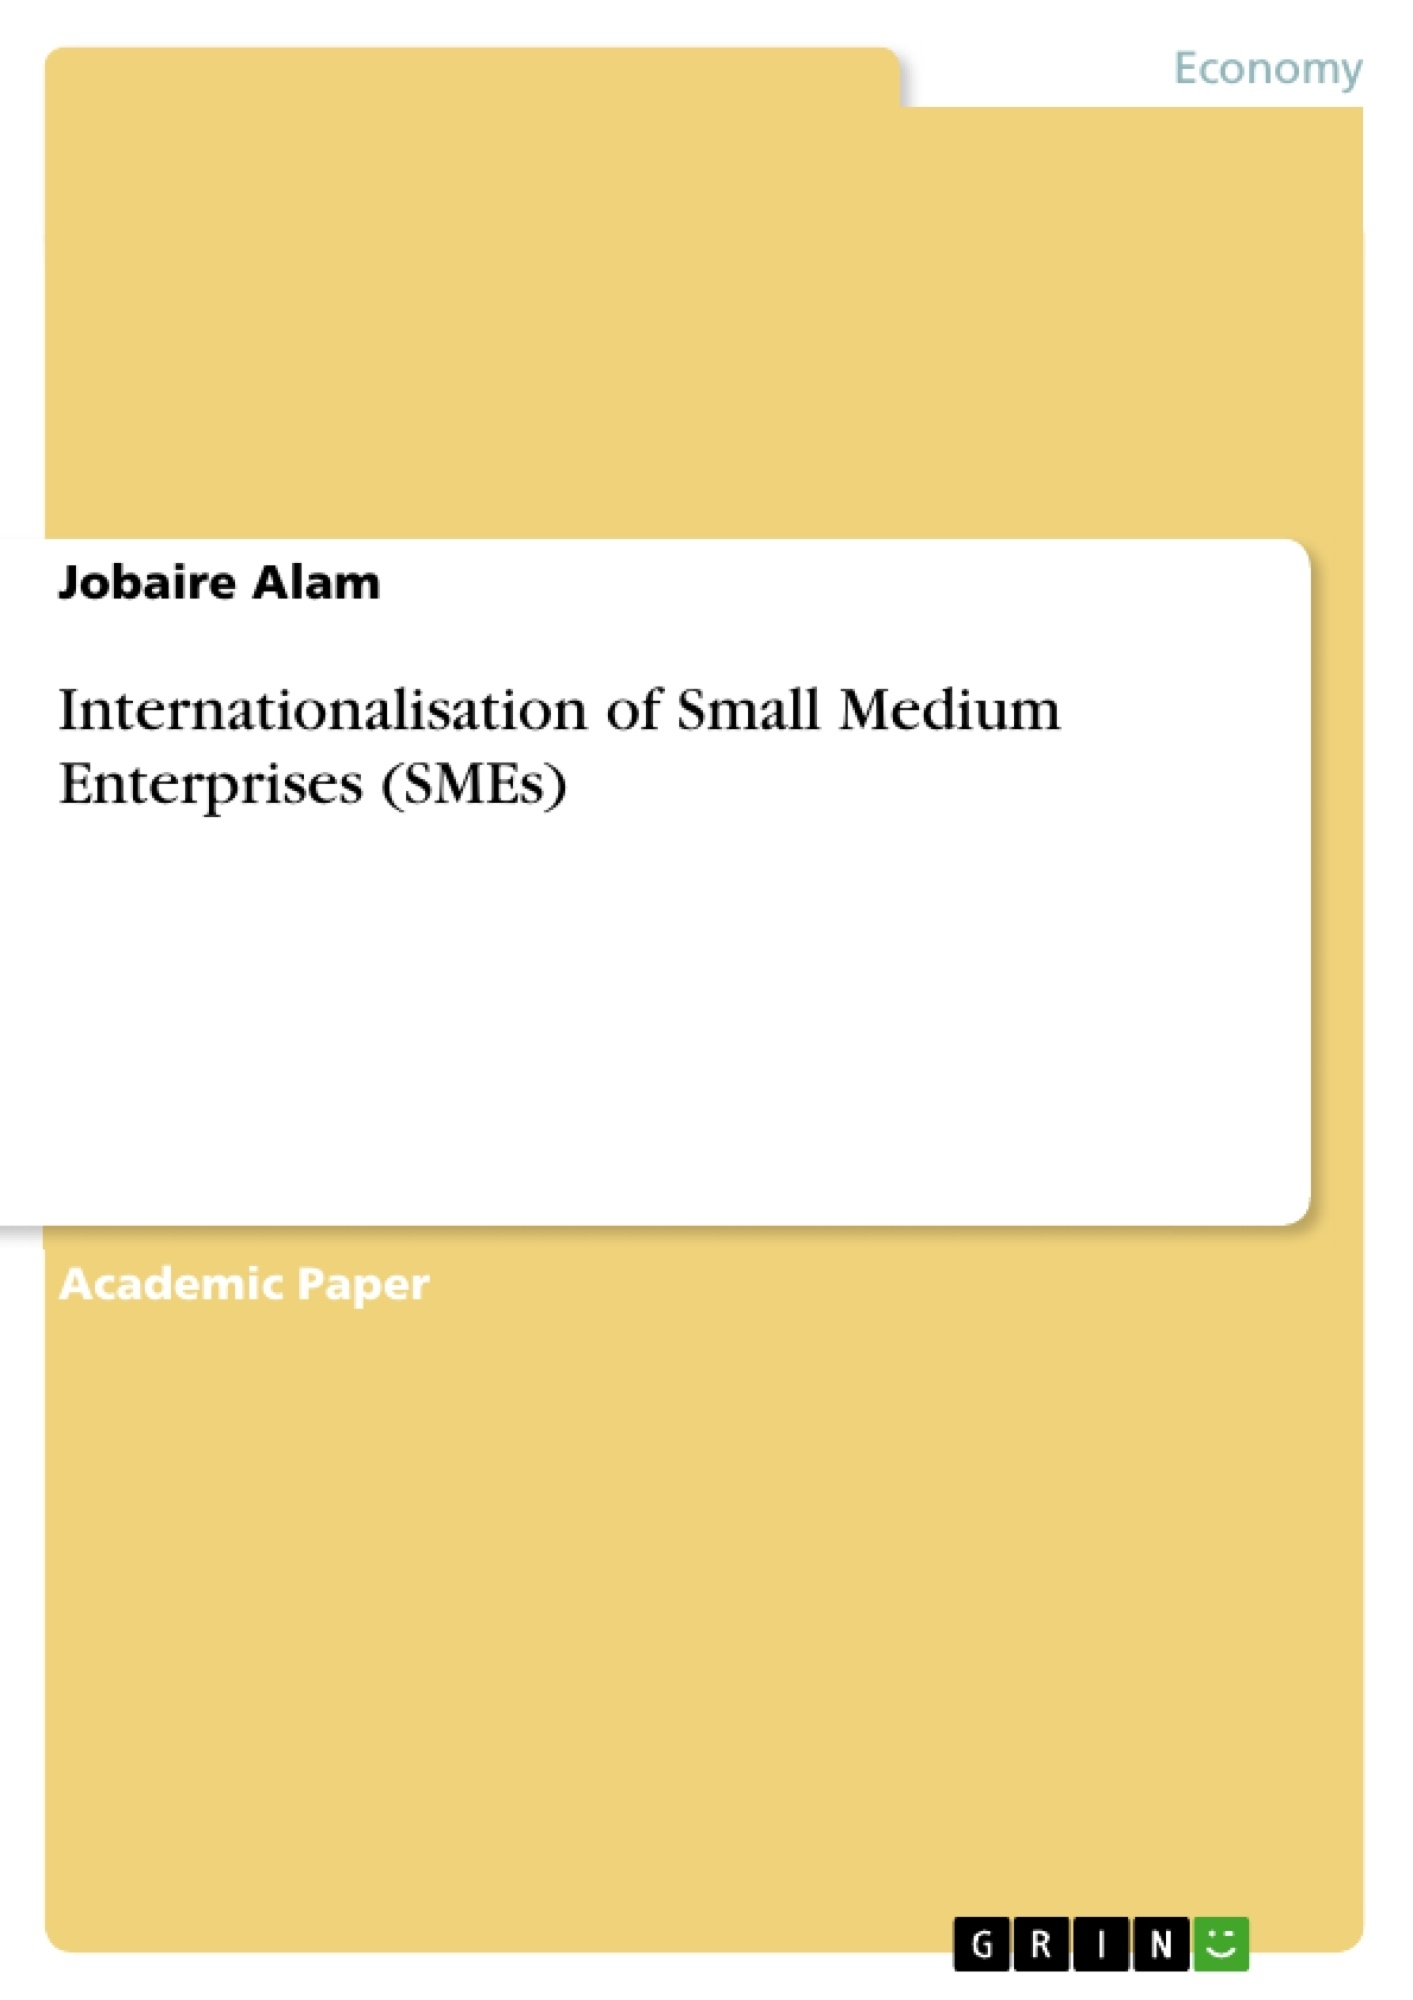 Title: Internationalisation of Small Medium Enterprises (SMEs)